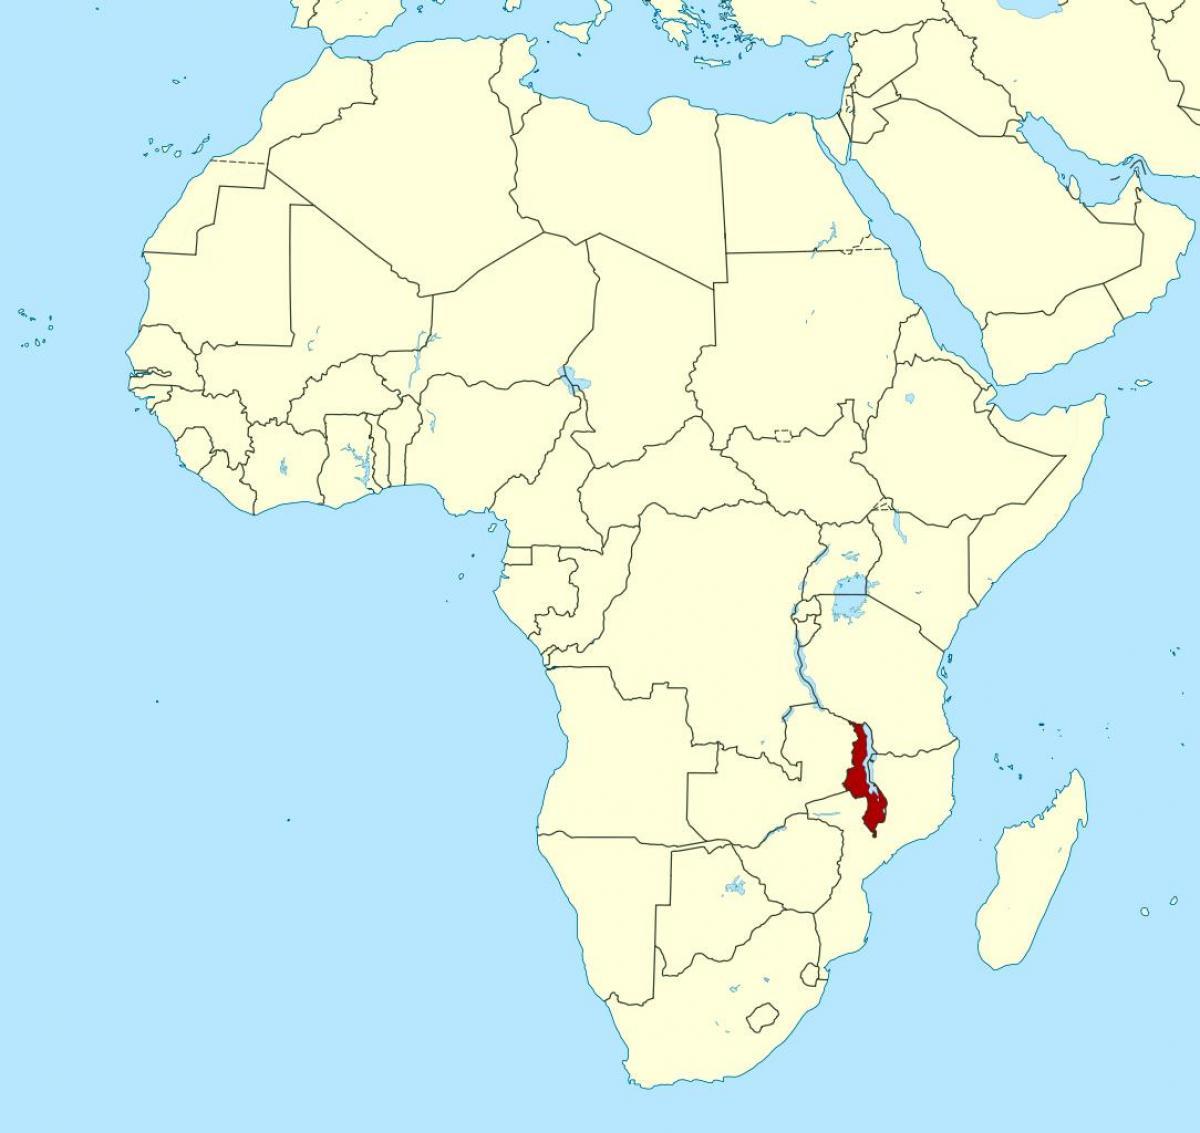 Karte Afrika.Malawi Landkarte Afrika Karte Von Malawi Landkarte Afrika